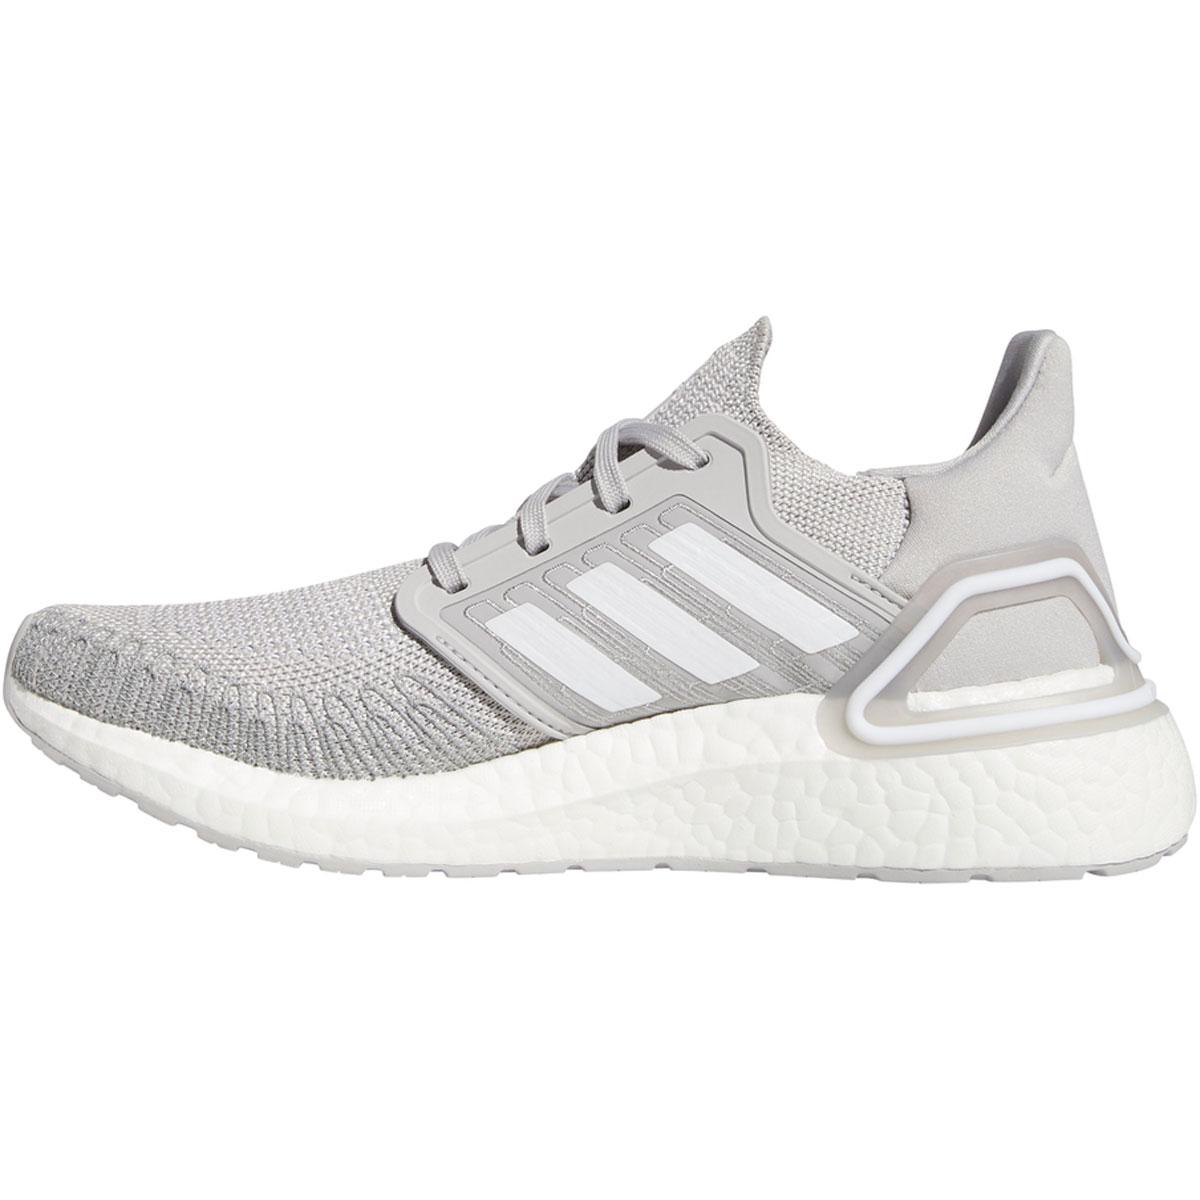 Women's Adidas Ultraboost 20 Running Shoe - Color: Grey - Size: 5 - Width: Regular, Grey, large, image 2